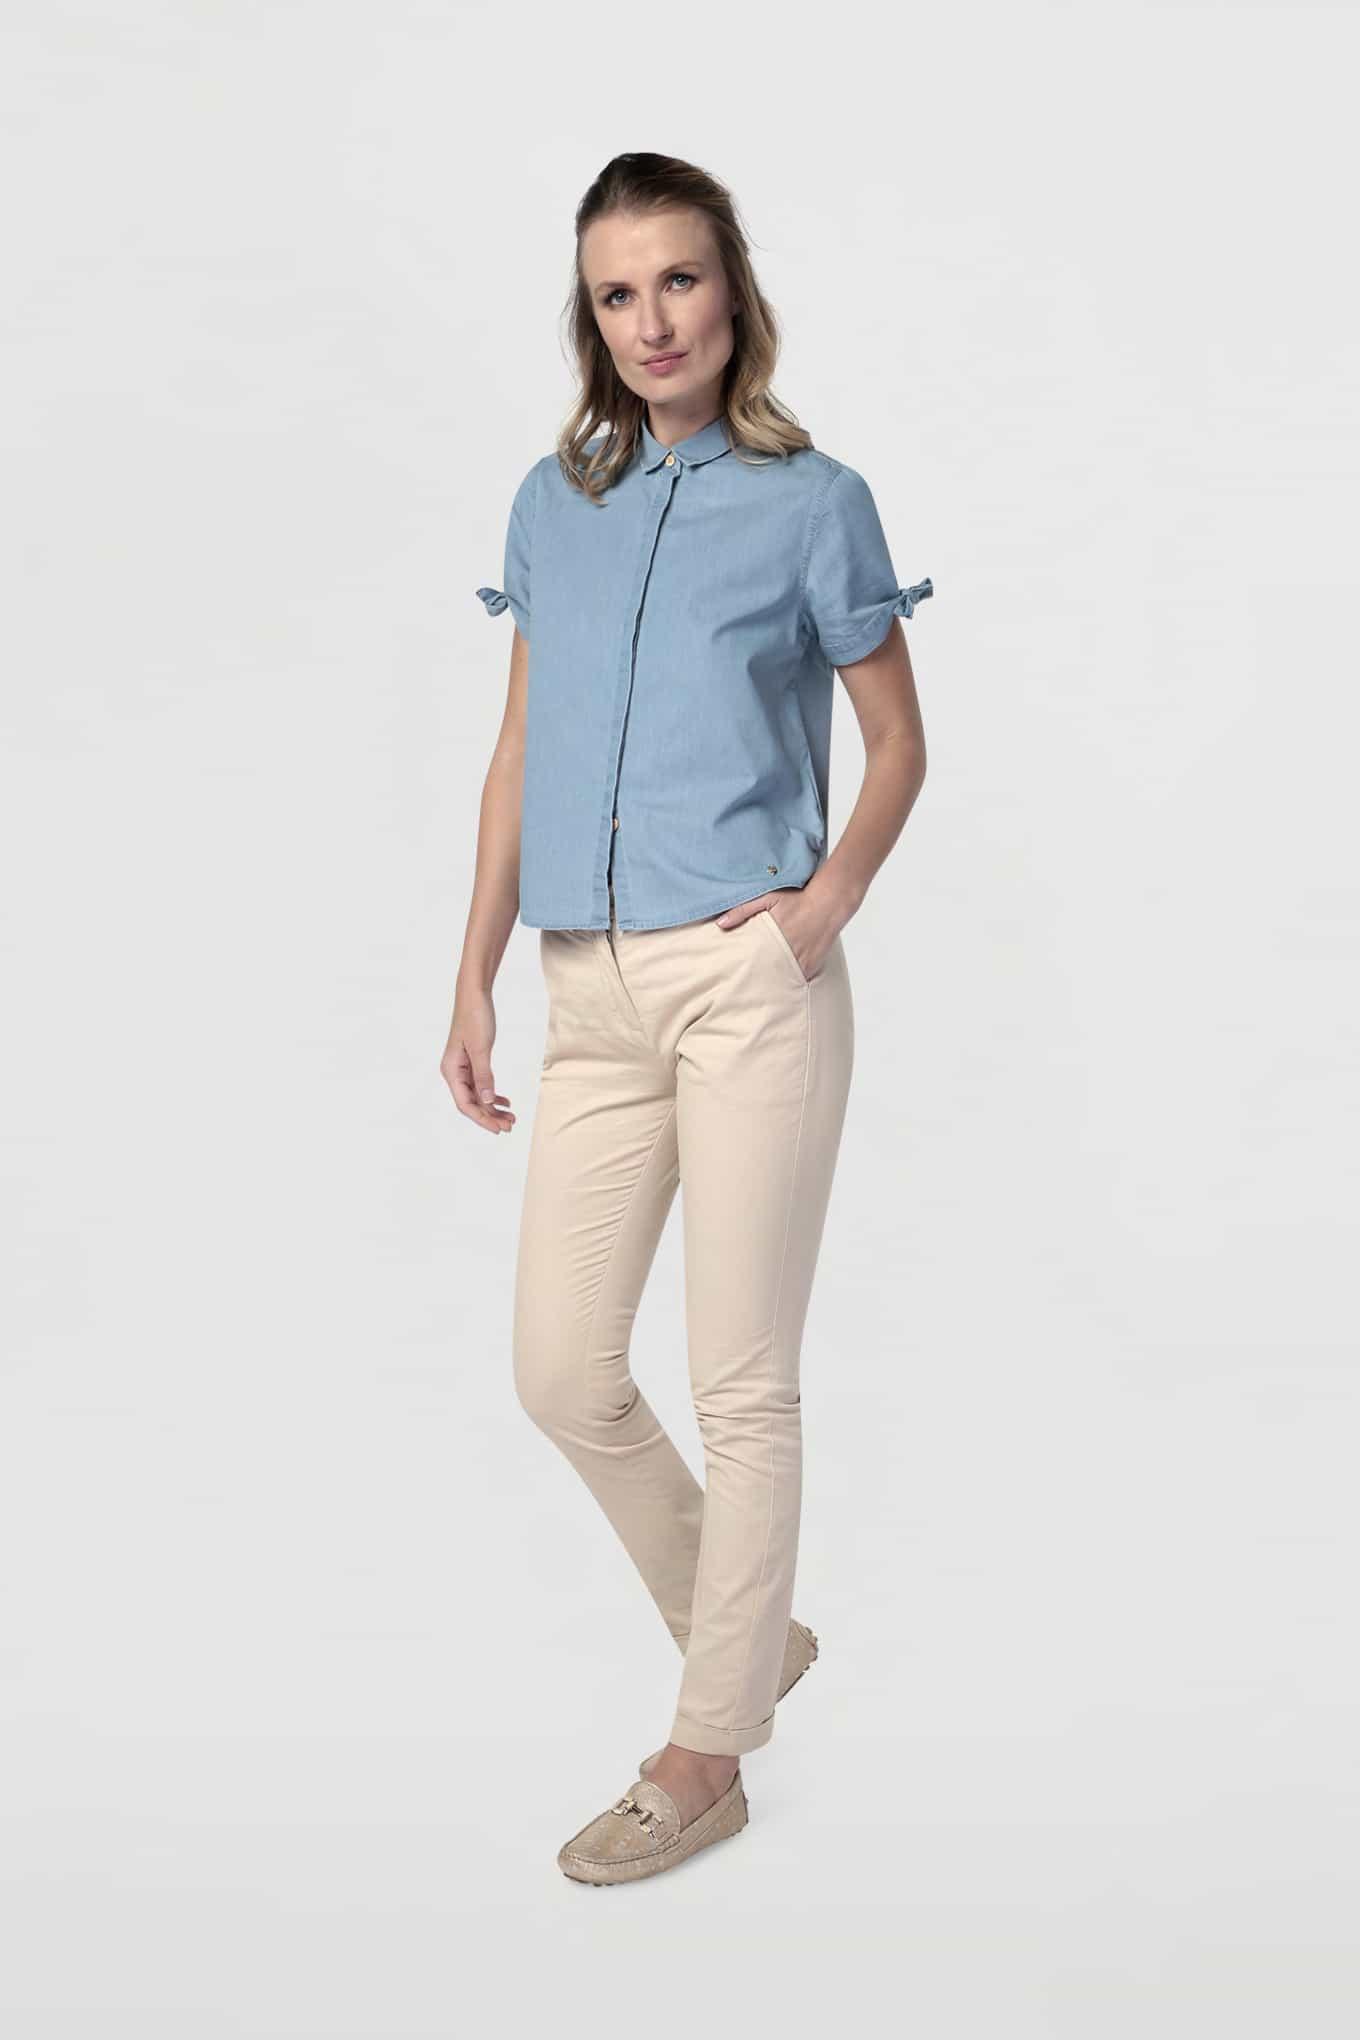 Shirt Blue Casual Woman